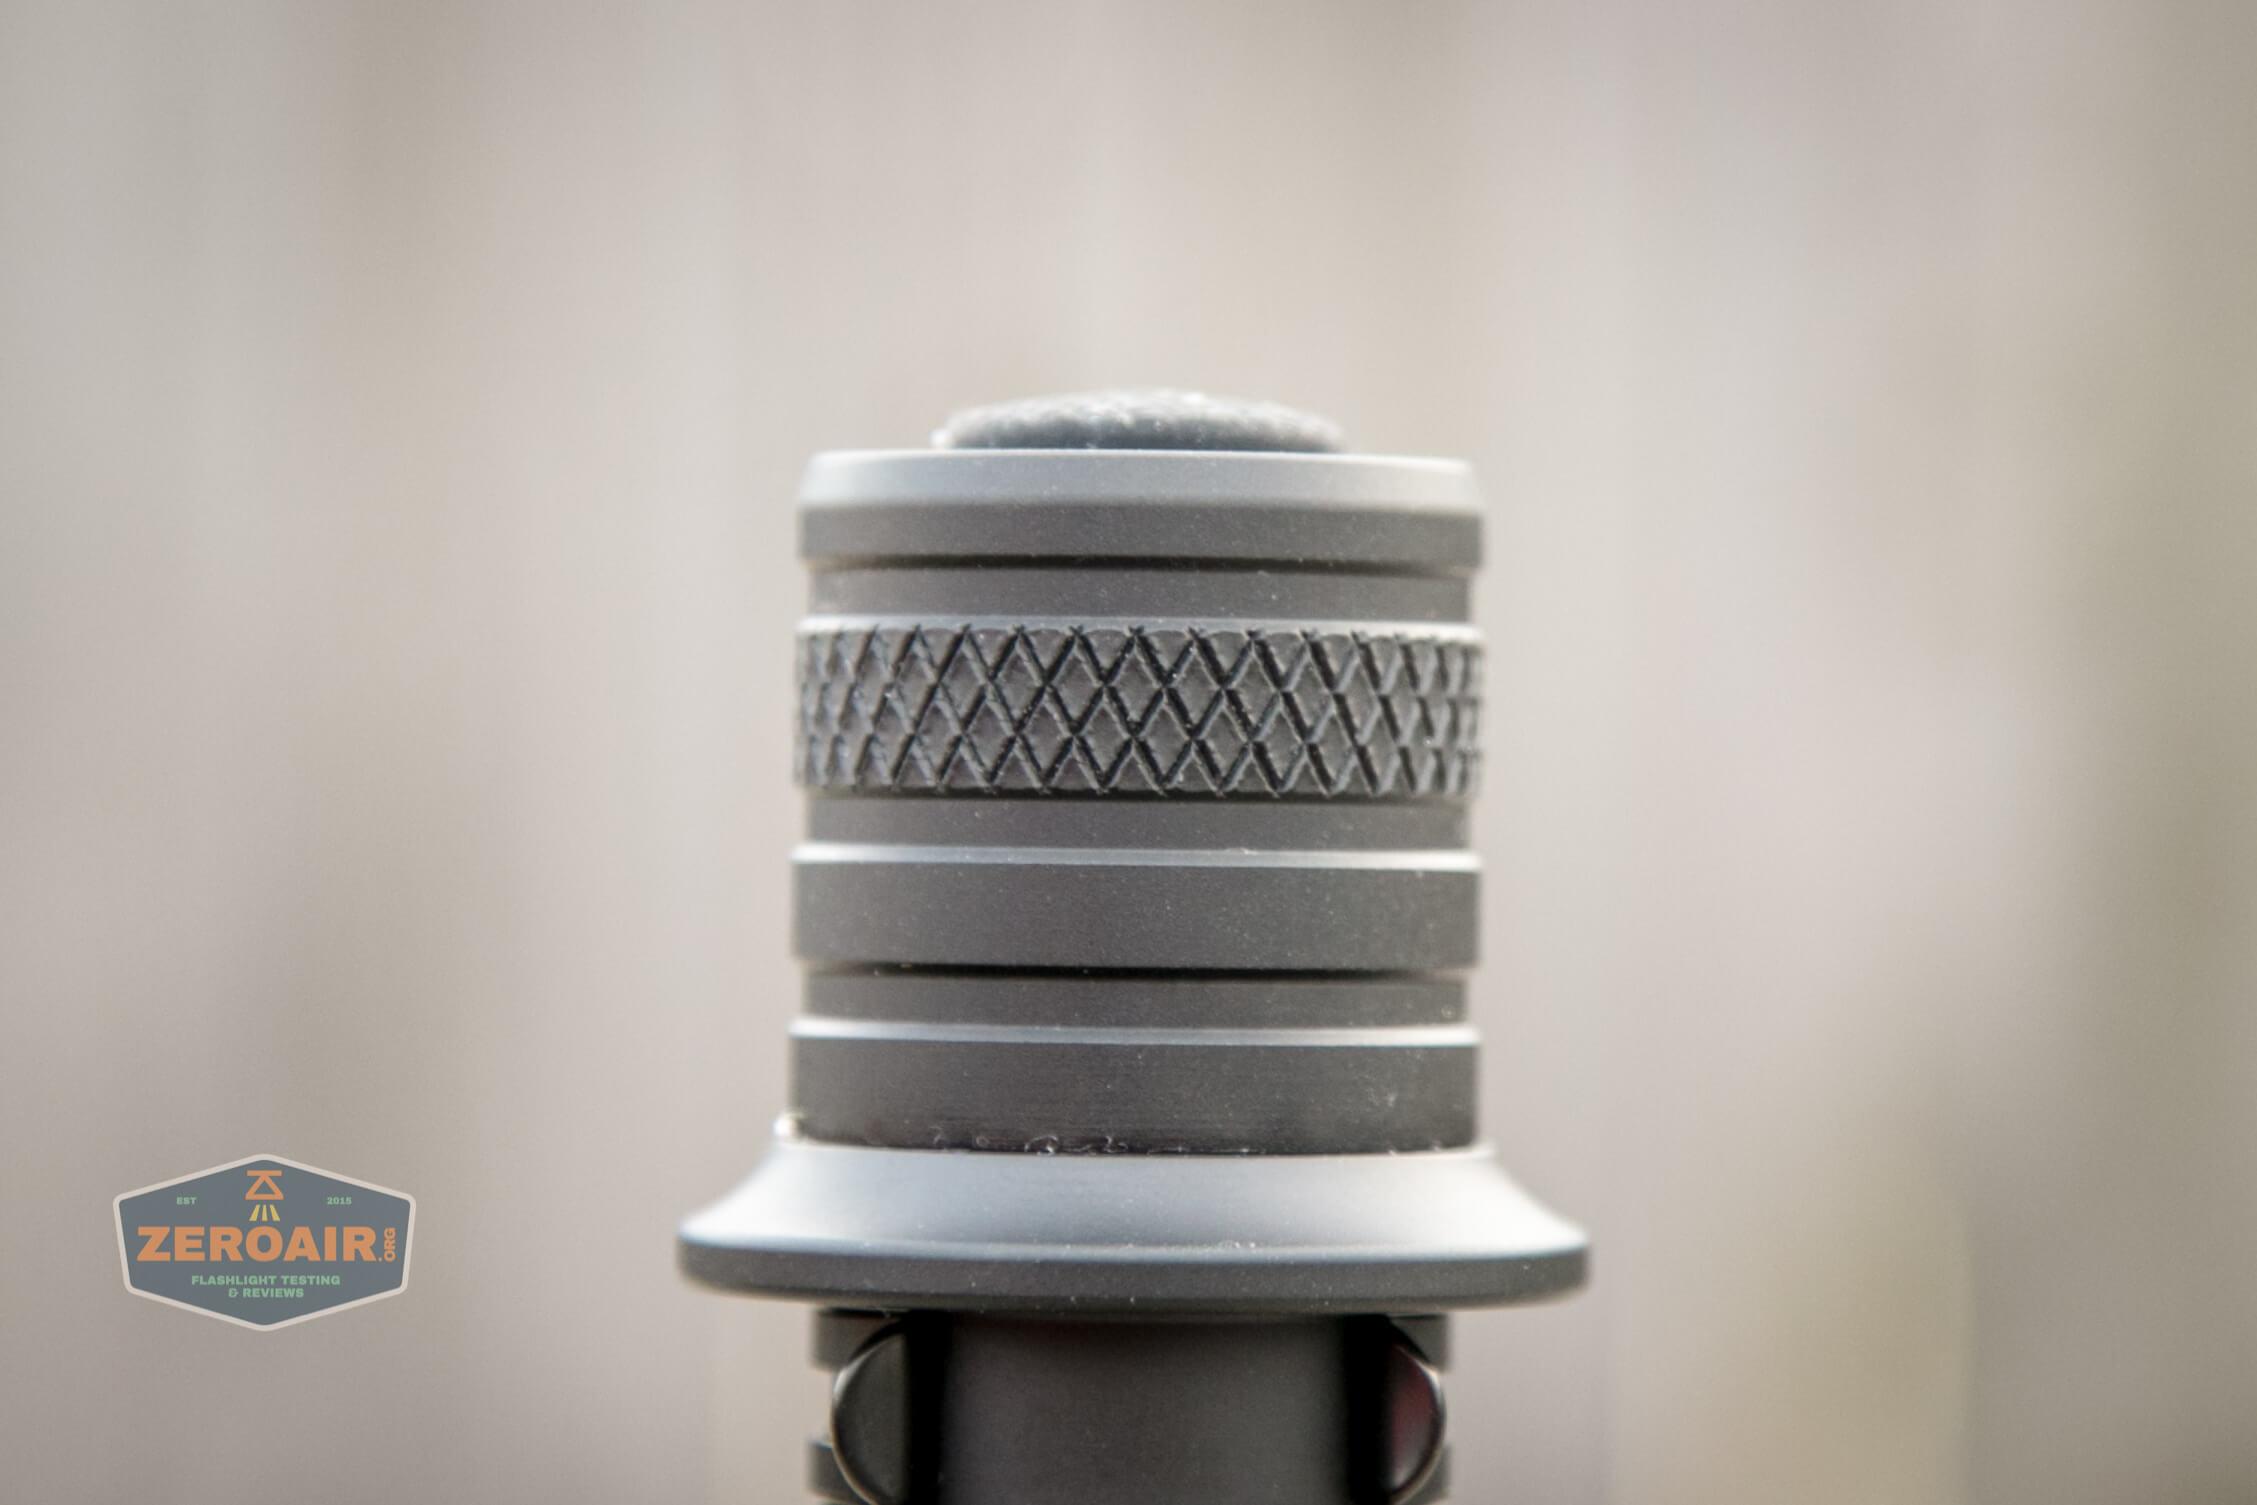 acebeam l35 flashlight tailcap knurling